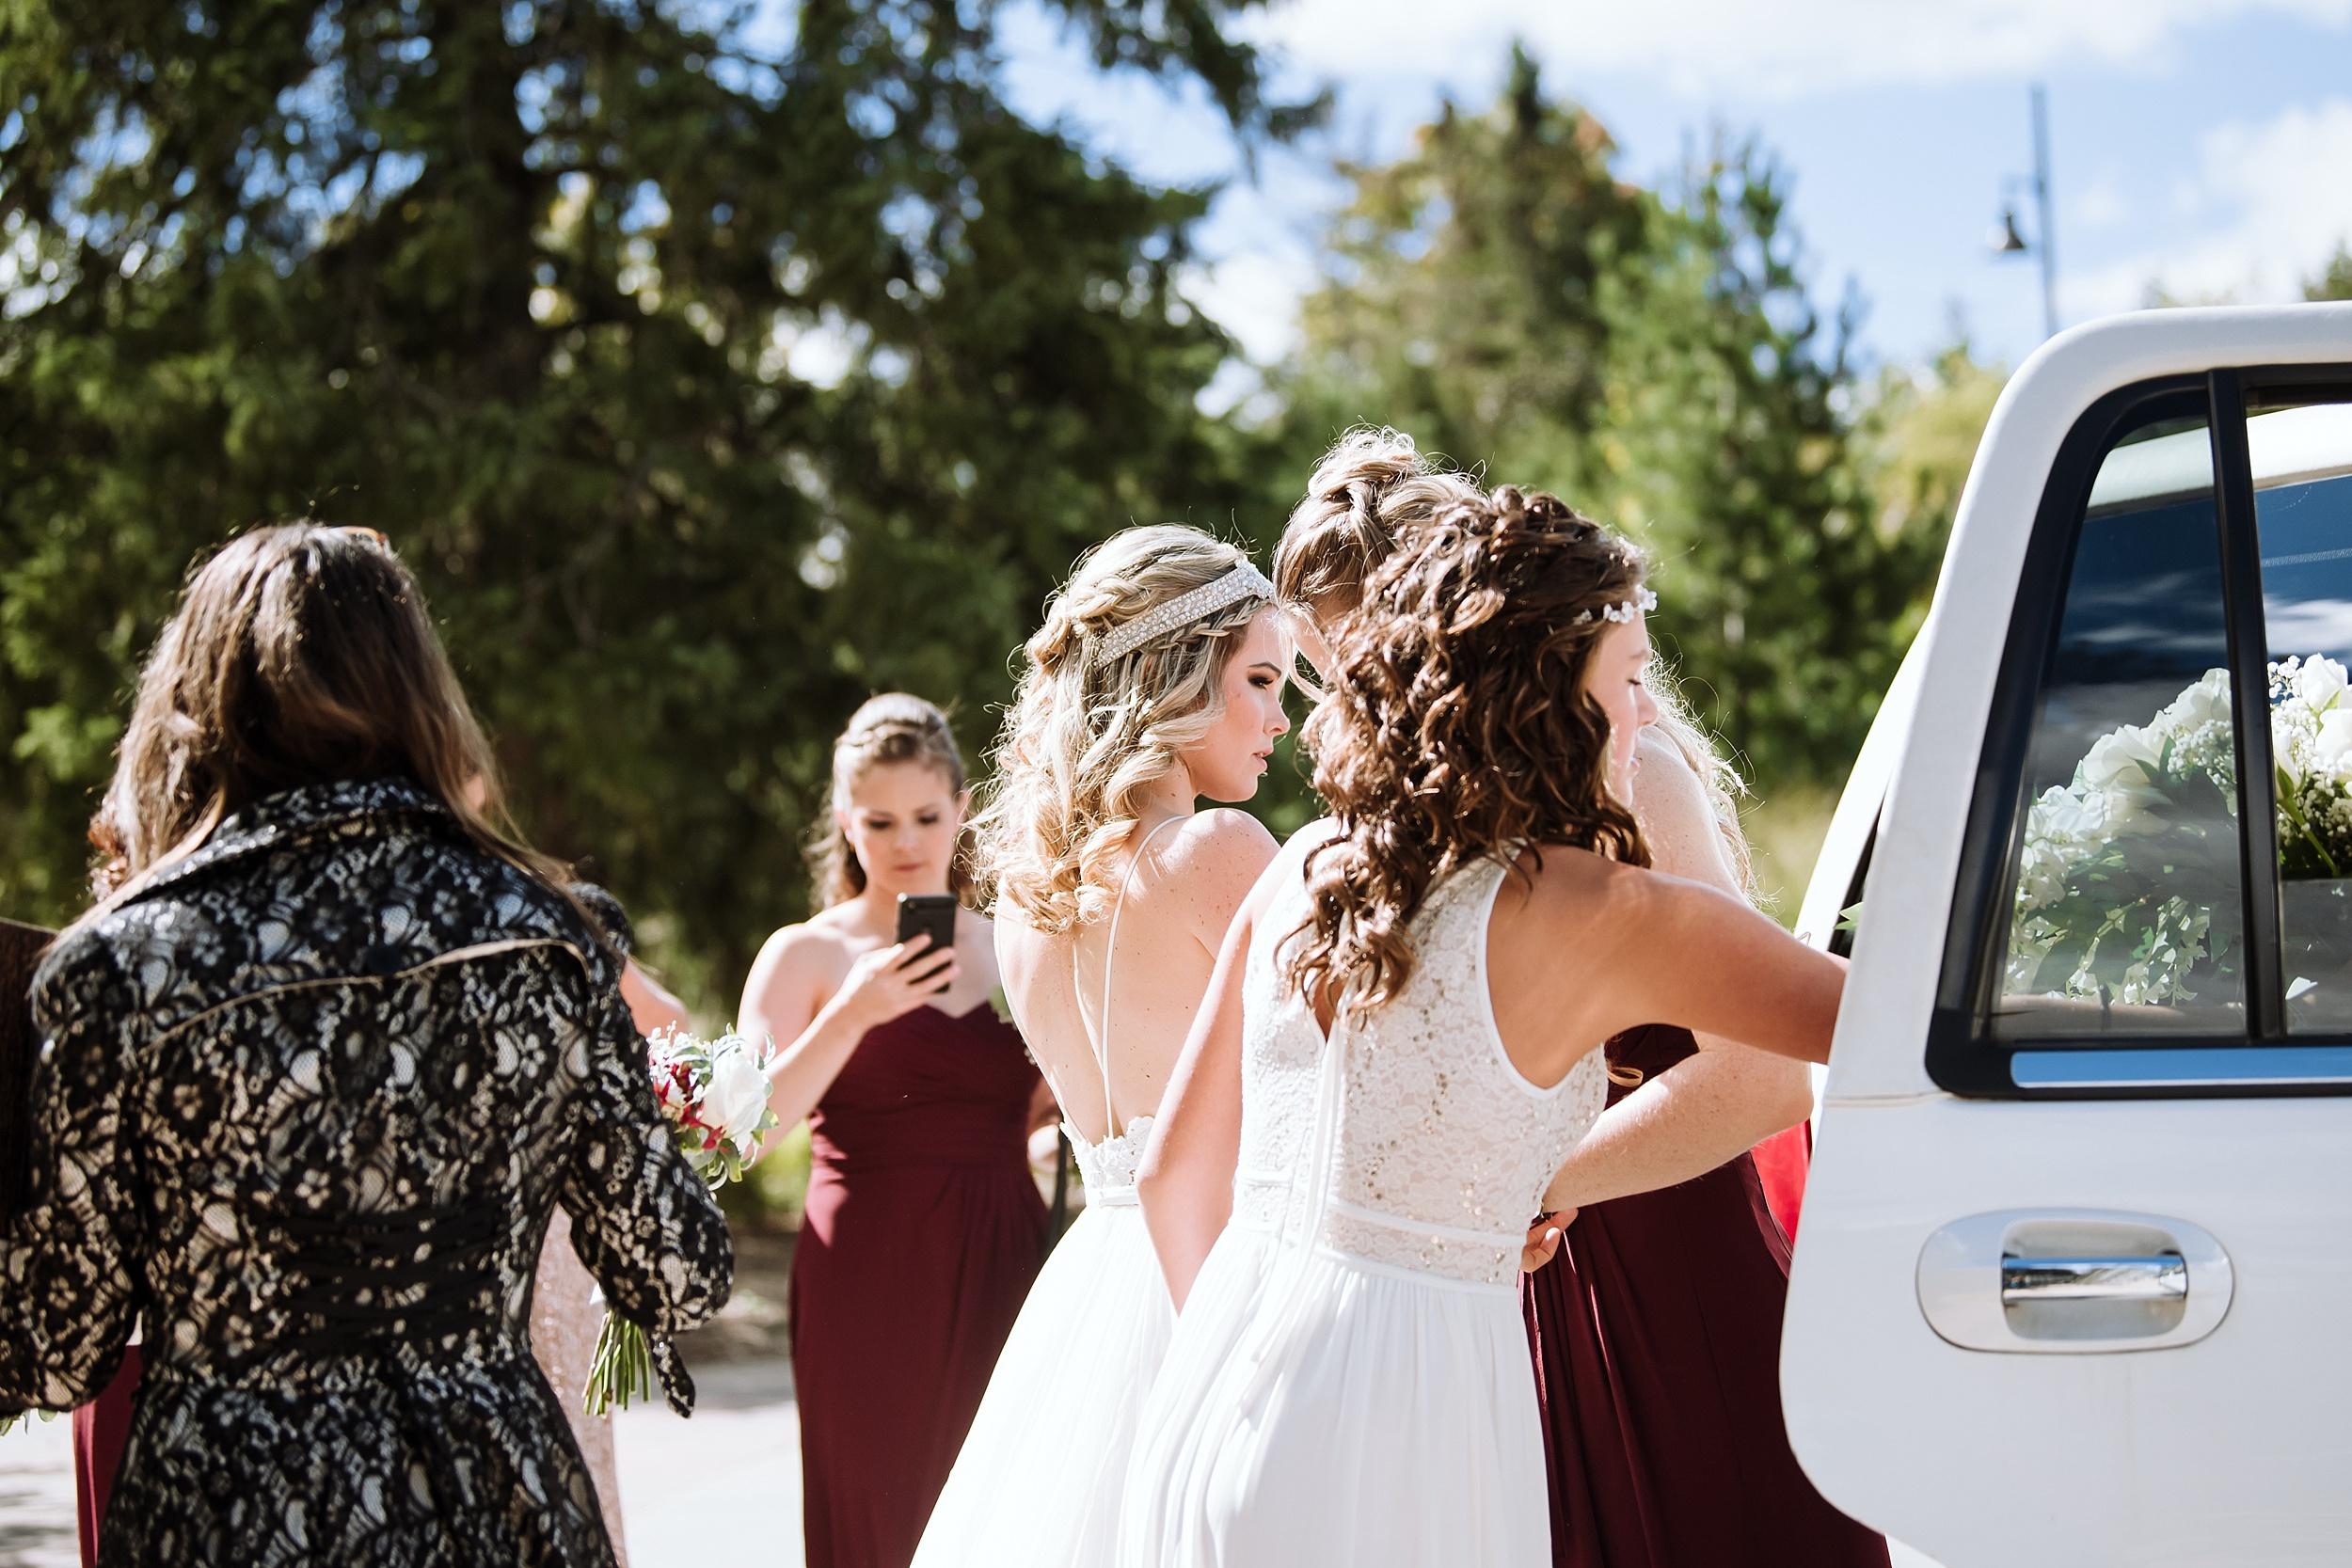 McMichael_Art_Collection_Wedding_chateau_le_jardin_Justine_Munro_Toronto_Photographer003.jpg